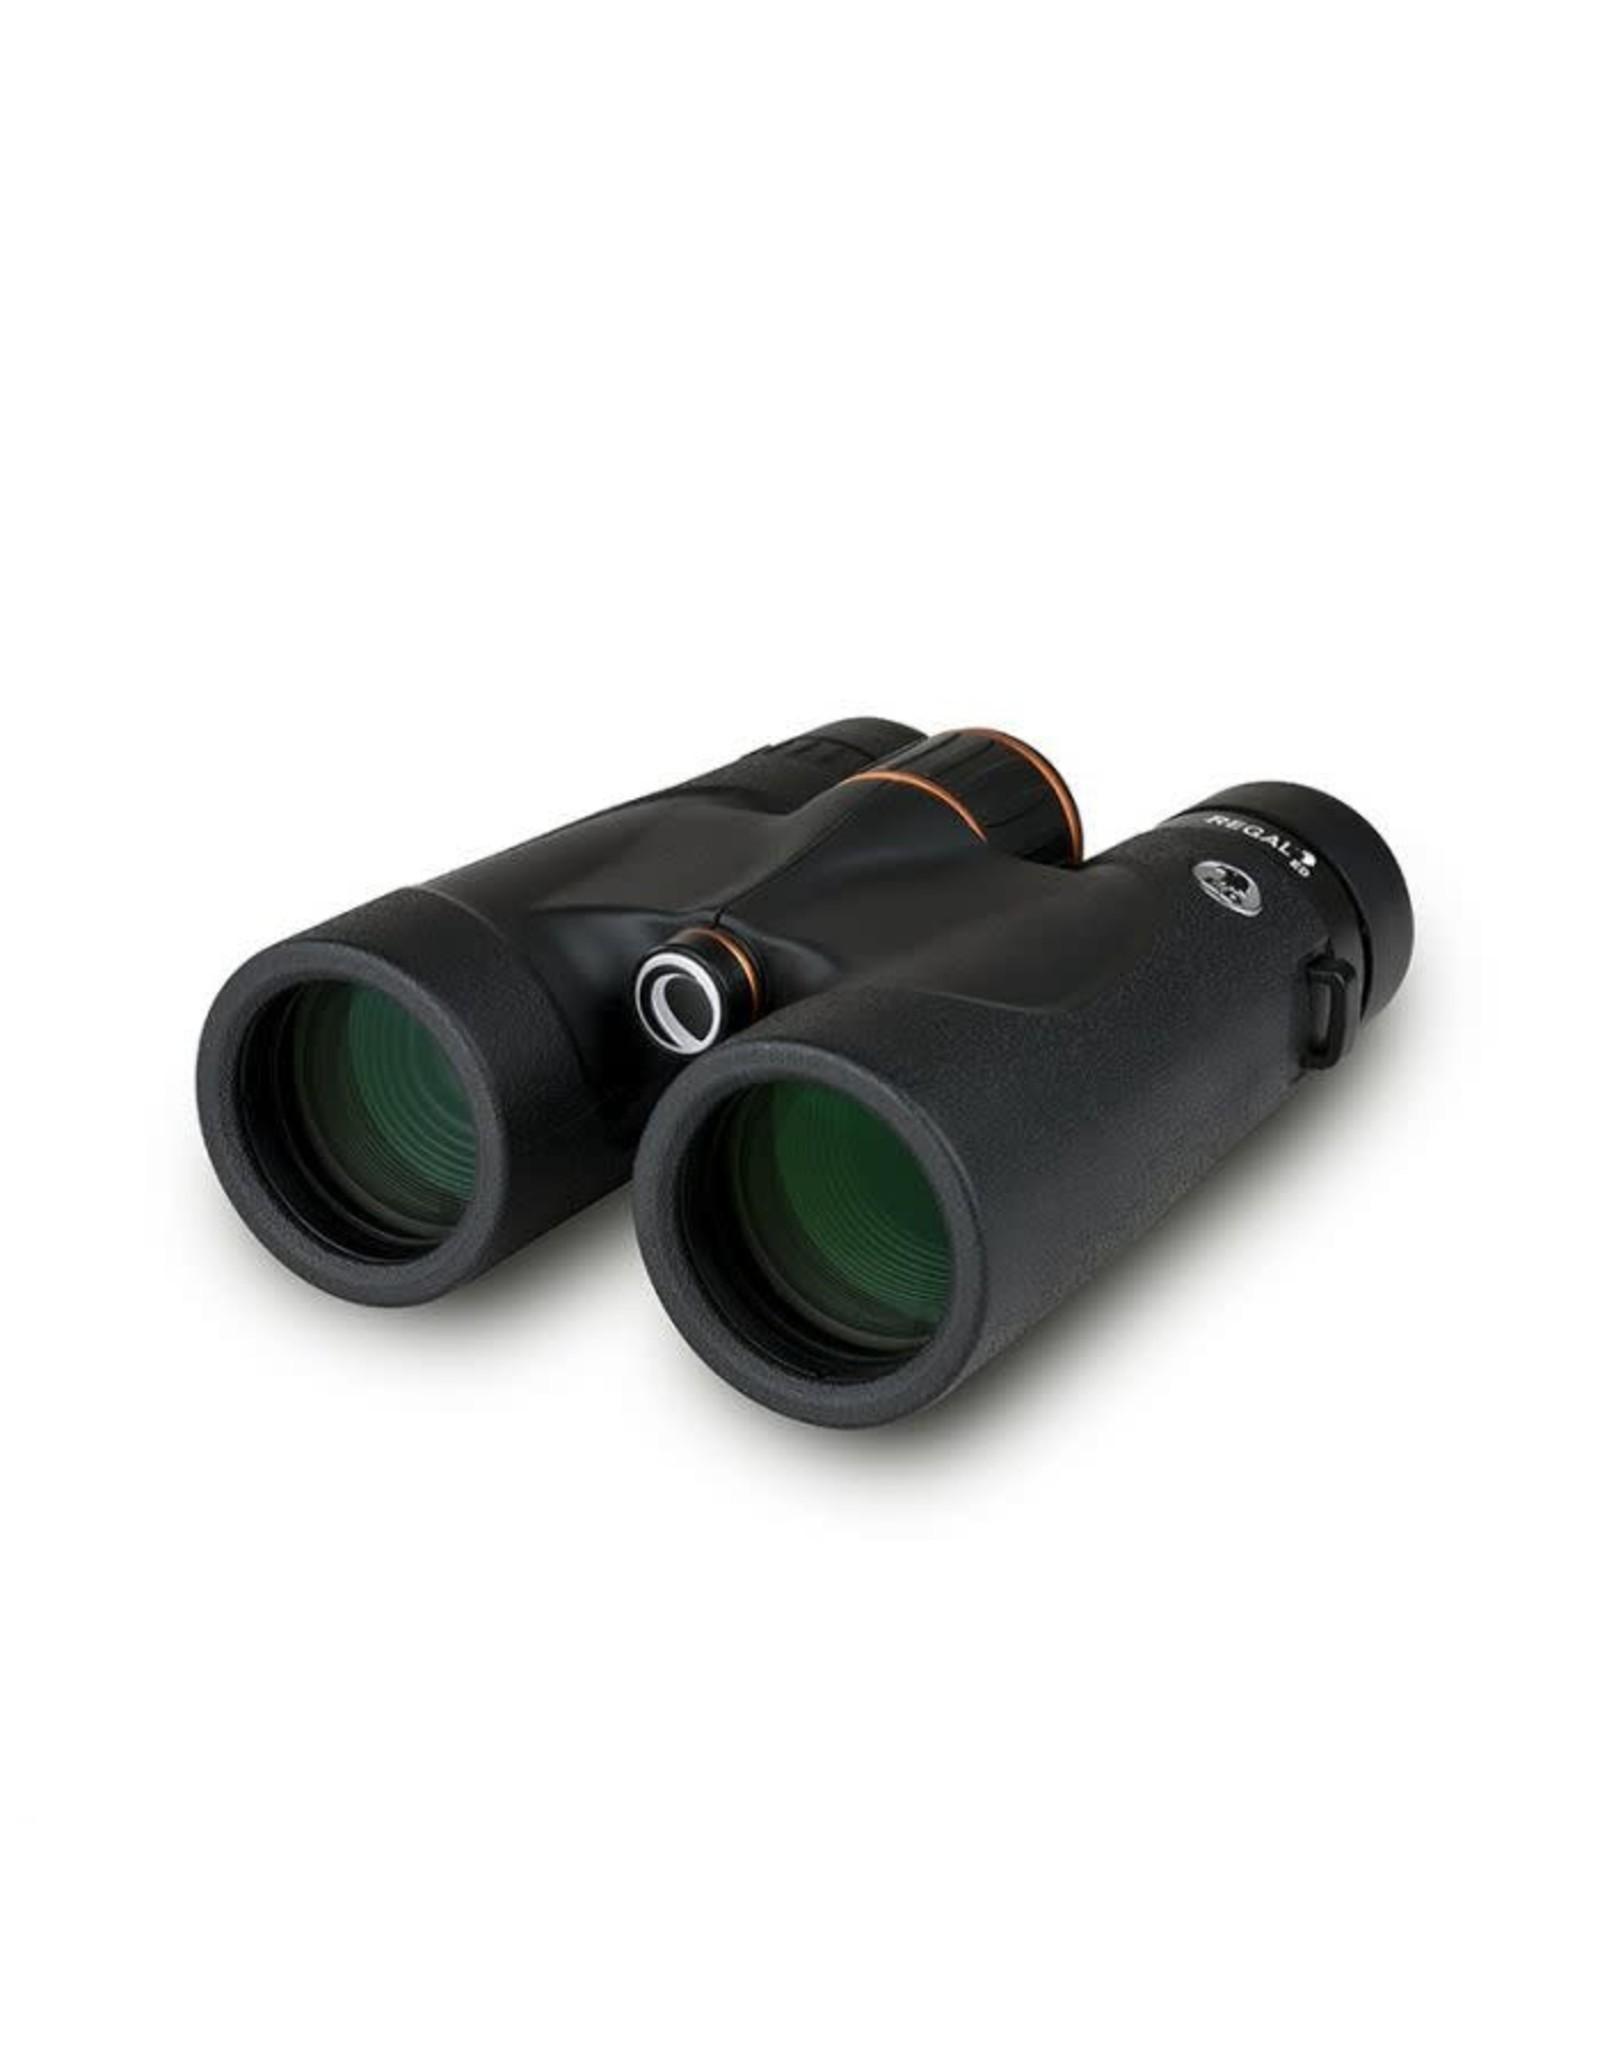 Celestron Celestron 8x42 Regal ED Roof Prism Binoculars